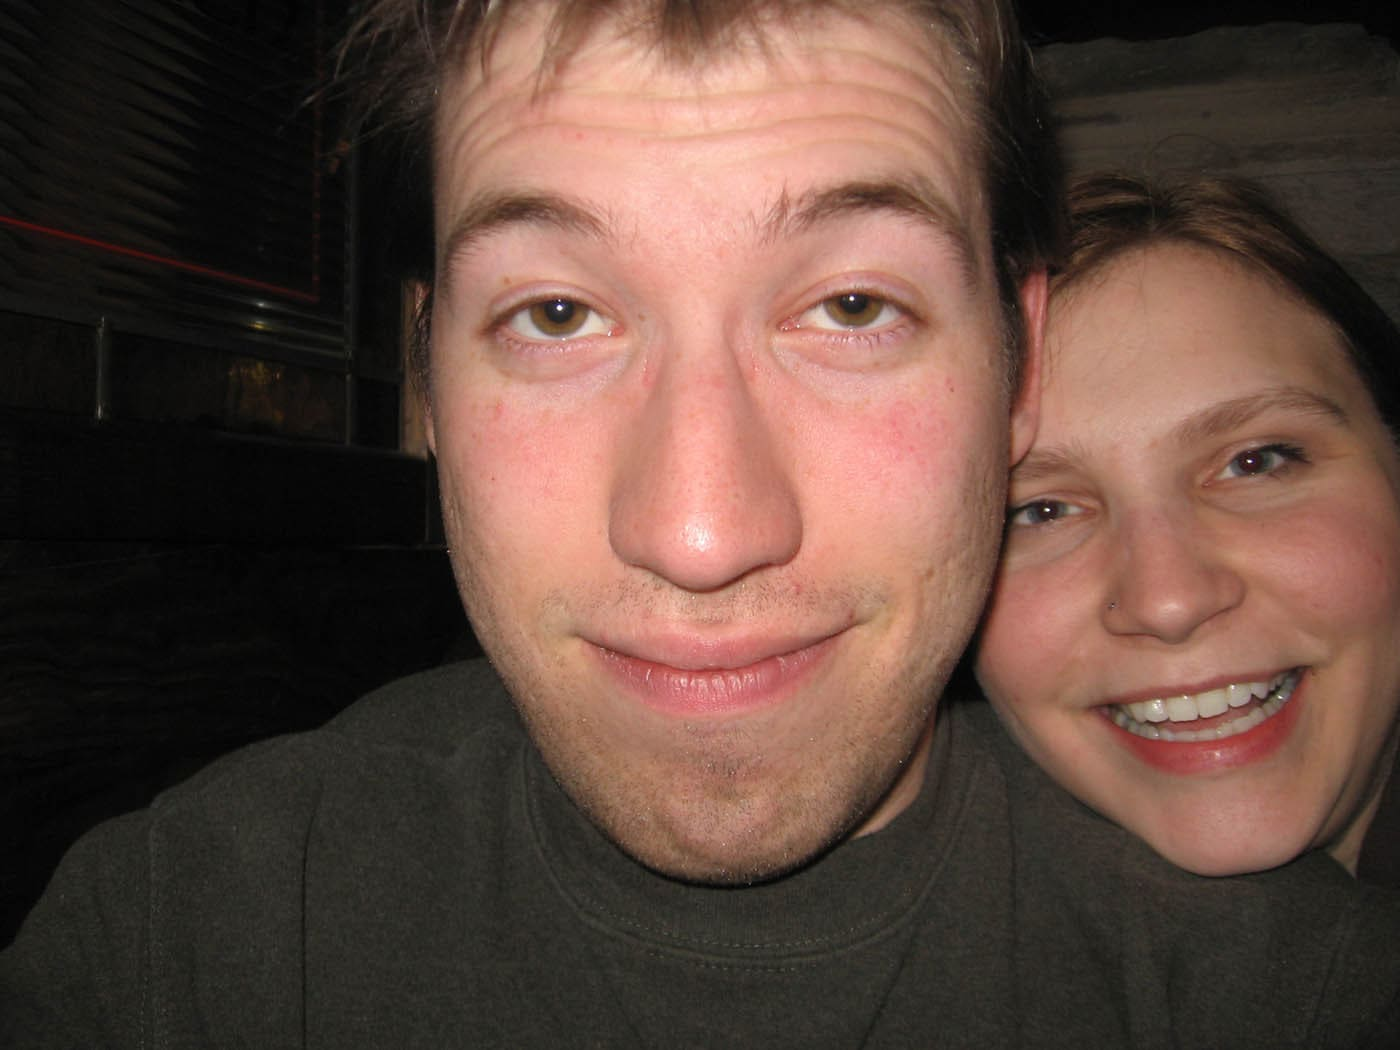 Me and Matt on his birthday